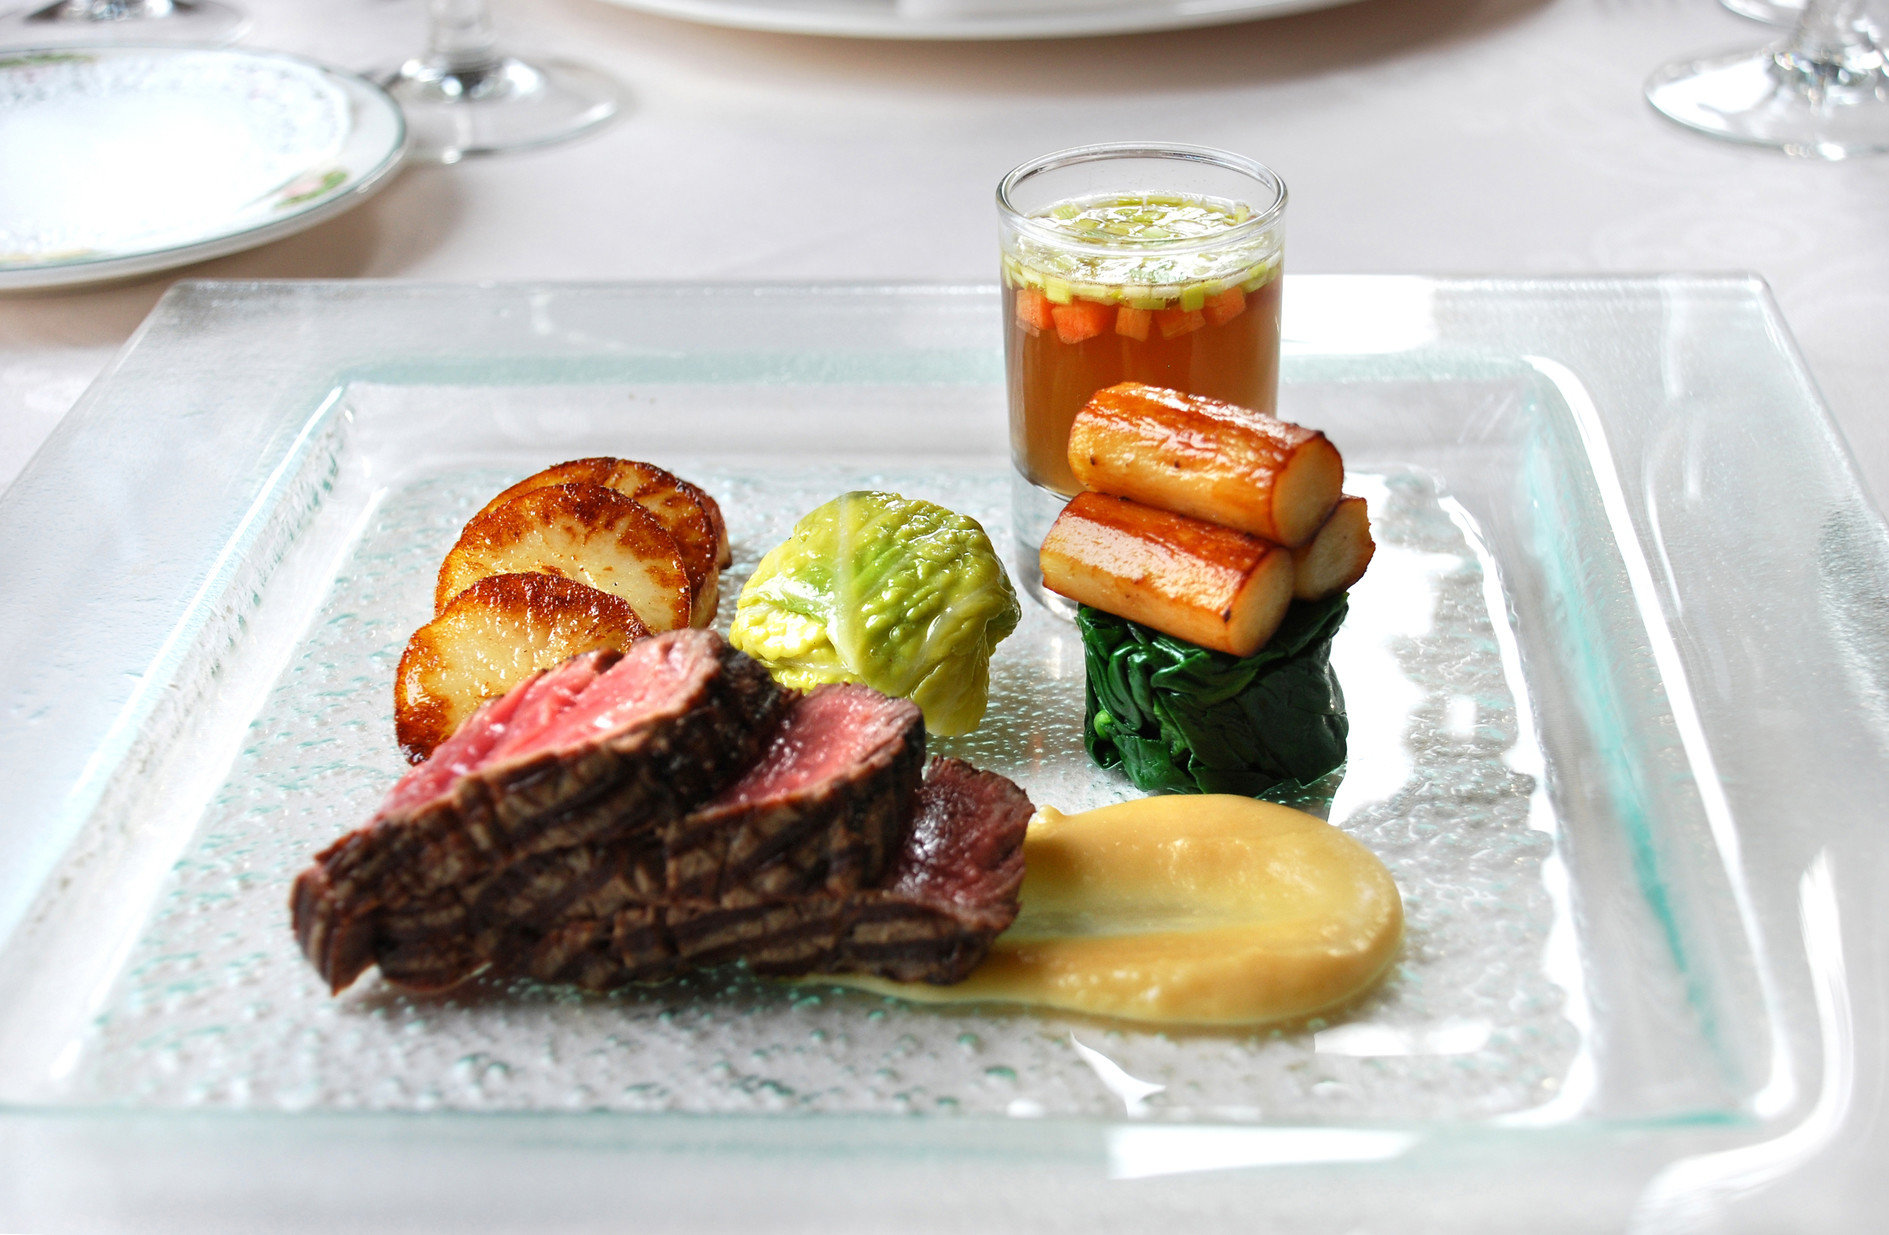 food breakfast lunch meat brunch restaurant steak cuisine fresh piece de resistance